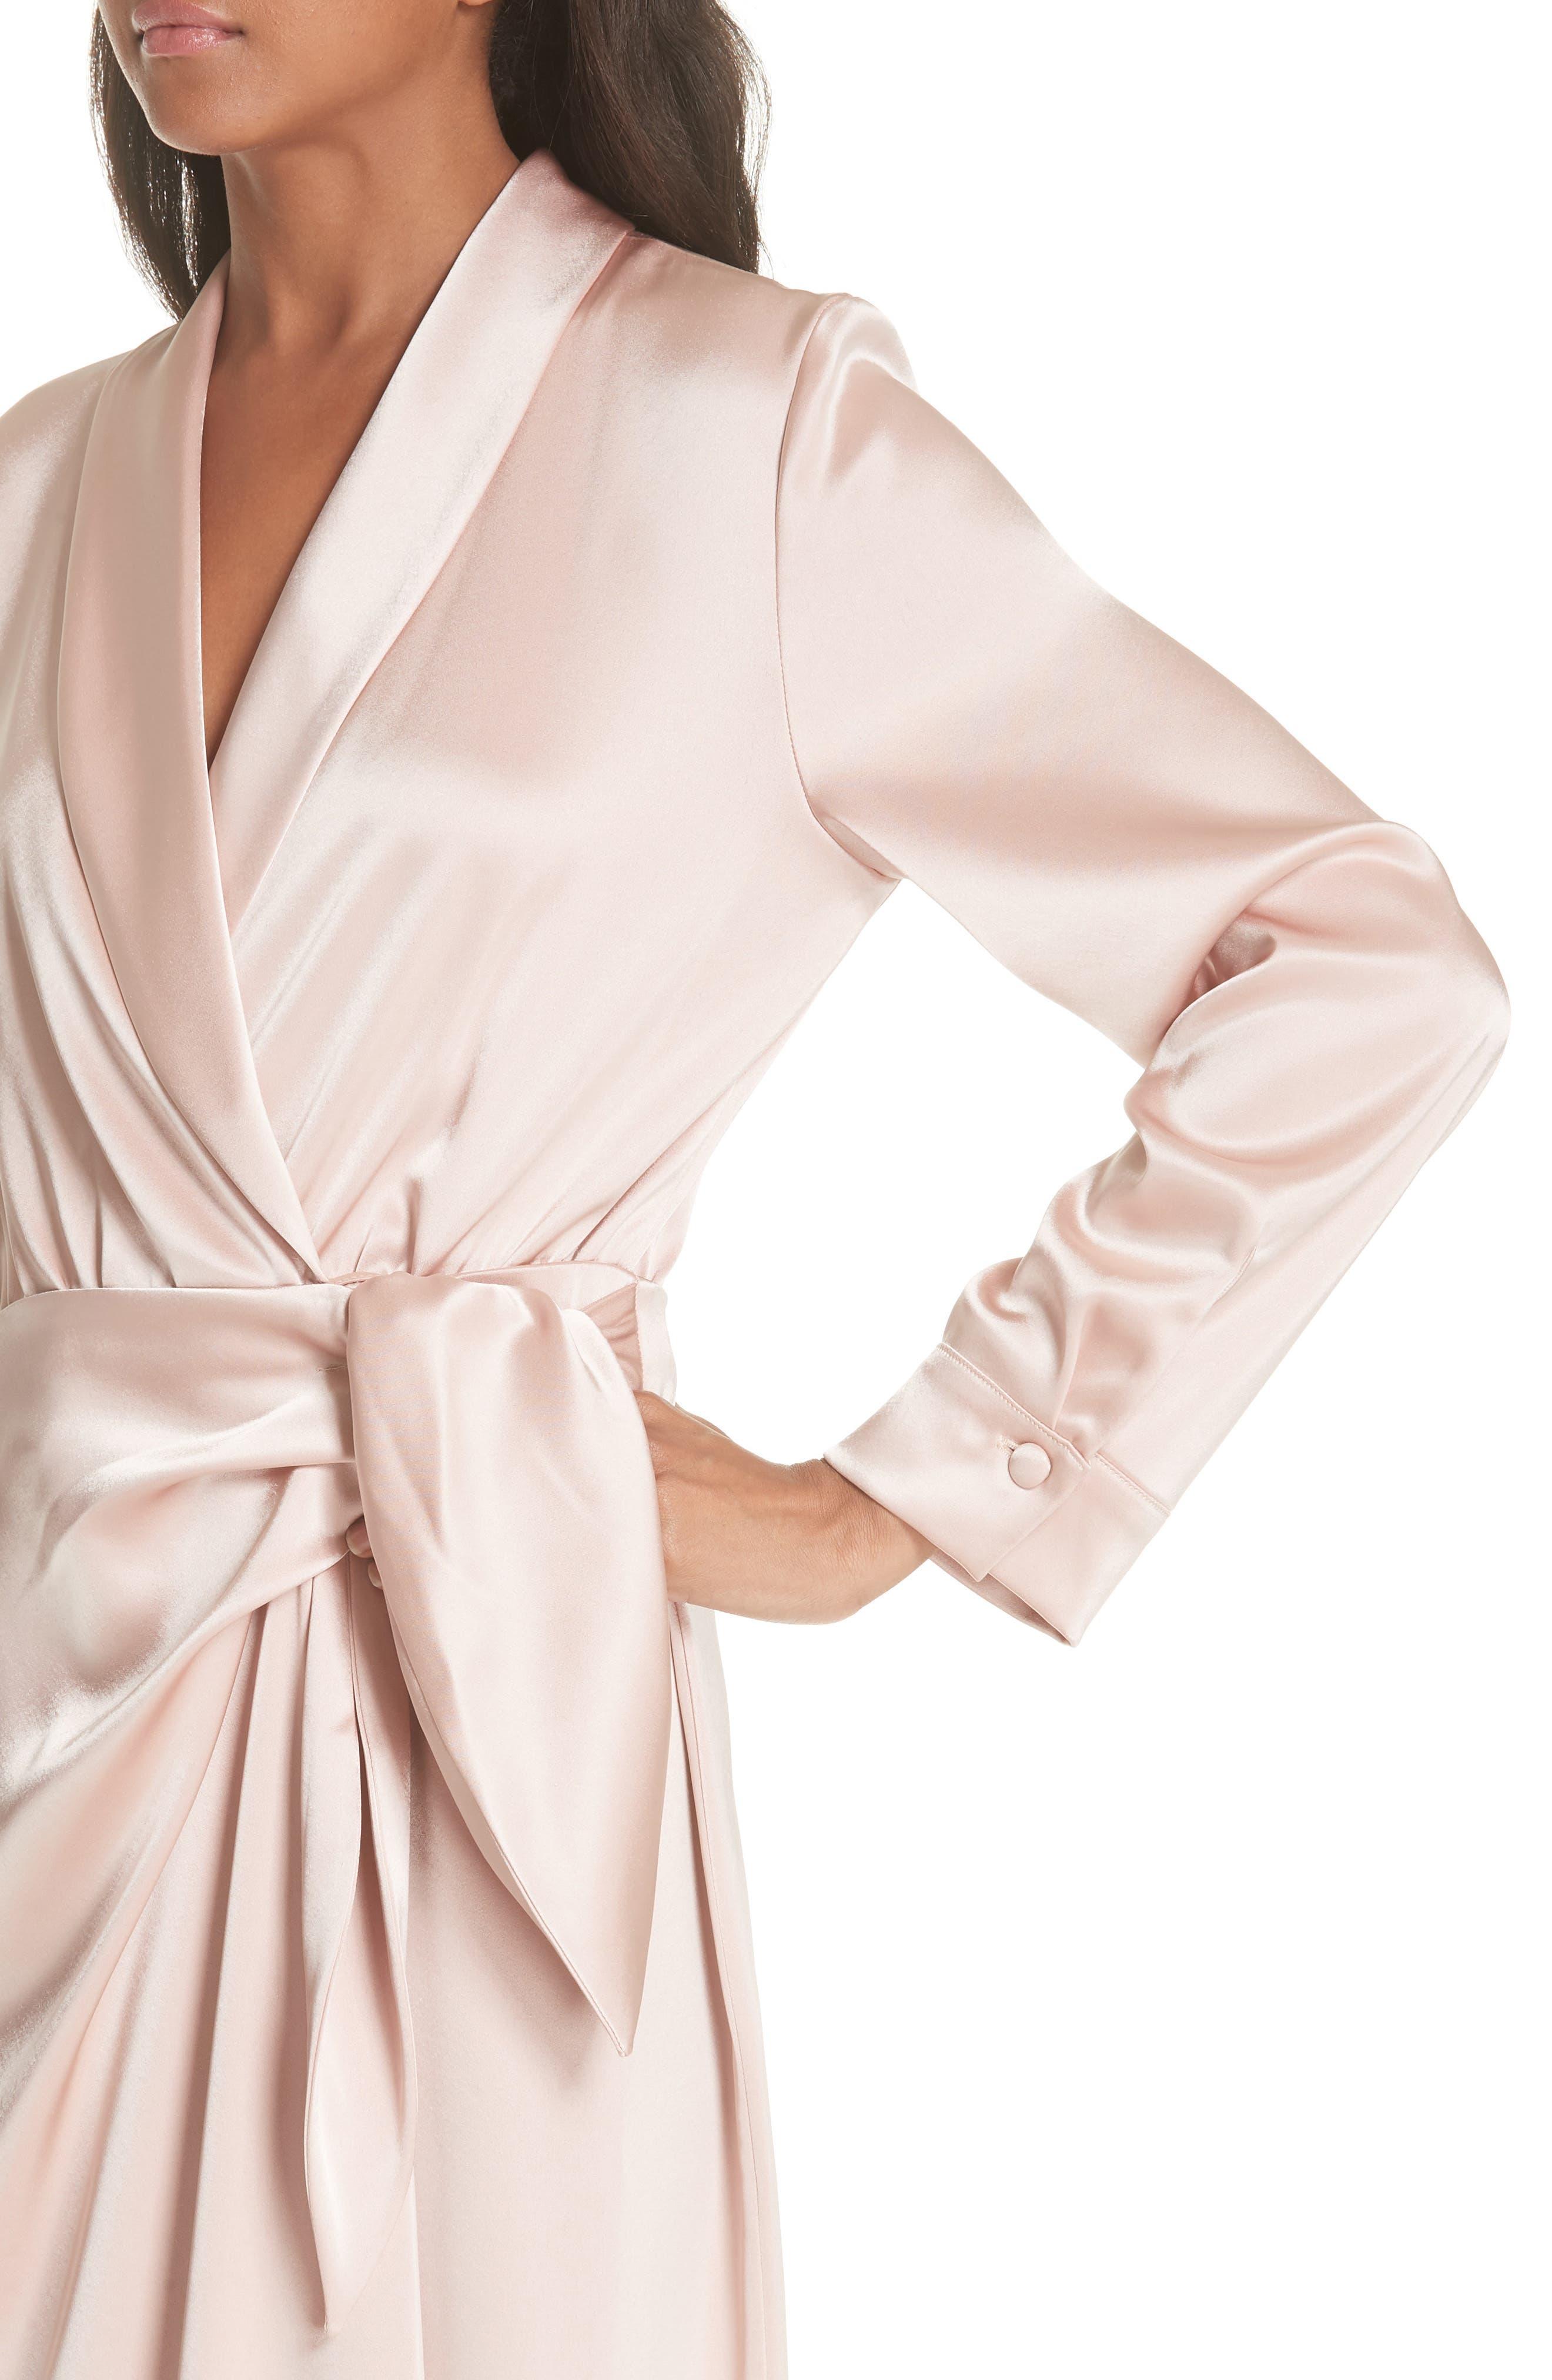 Ezra Satin Wrap Dress,                             Alternate thumbnail 4, color,                             Desert Rose